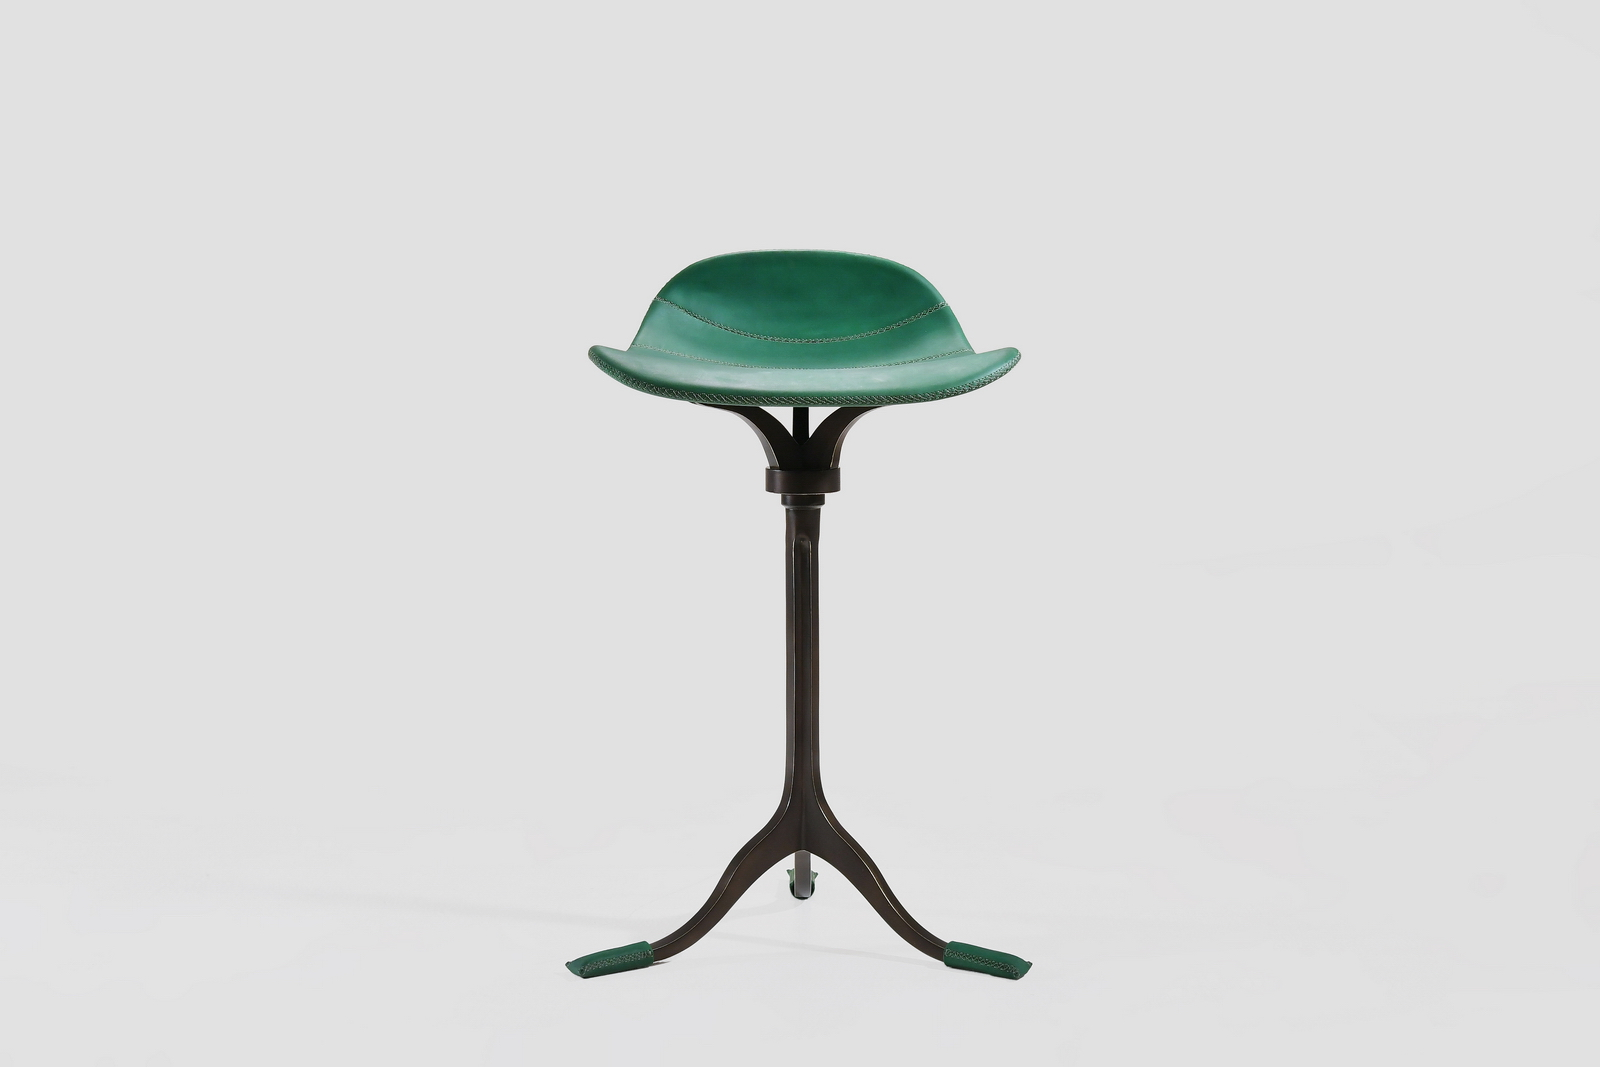 PTendercool-Chair-PT48-BS3-GR-03